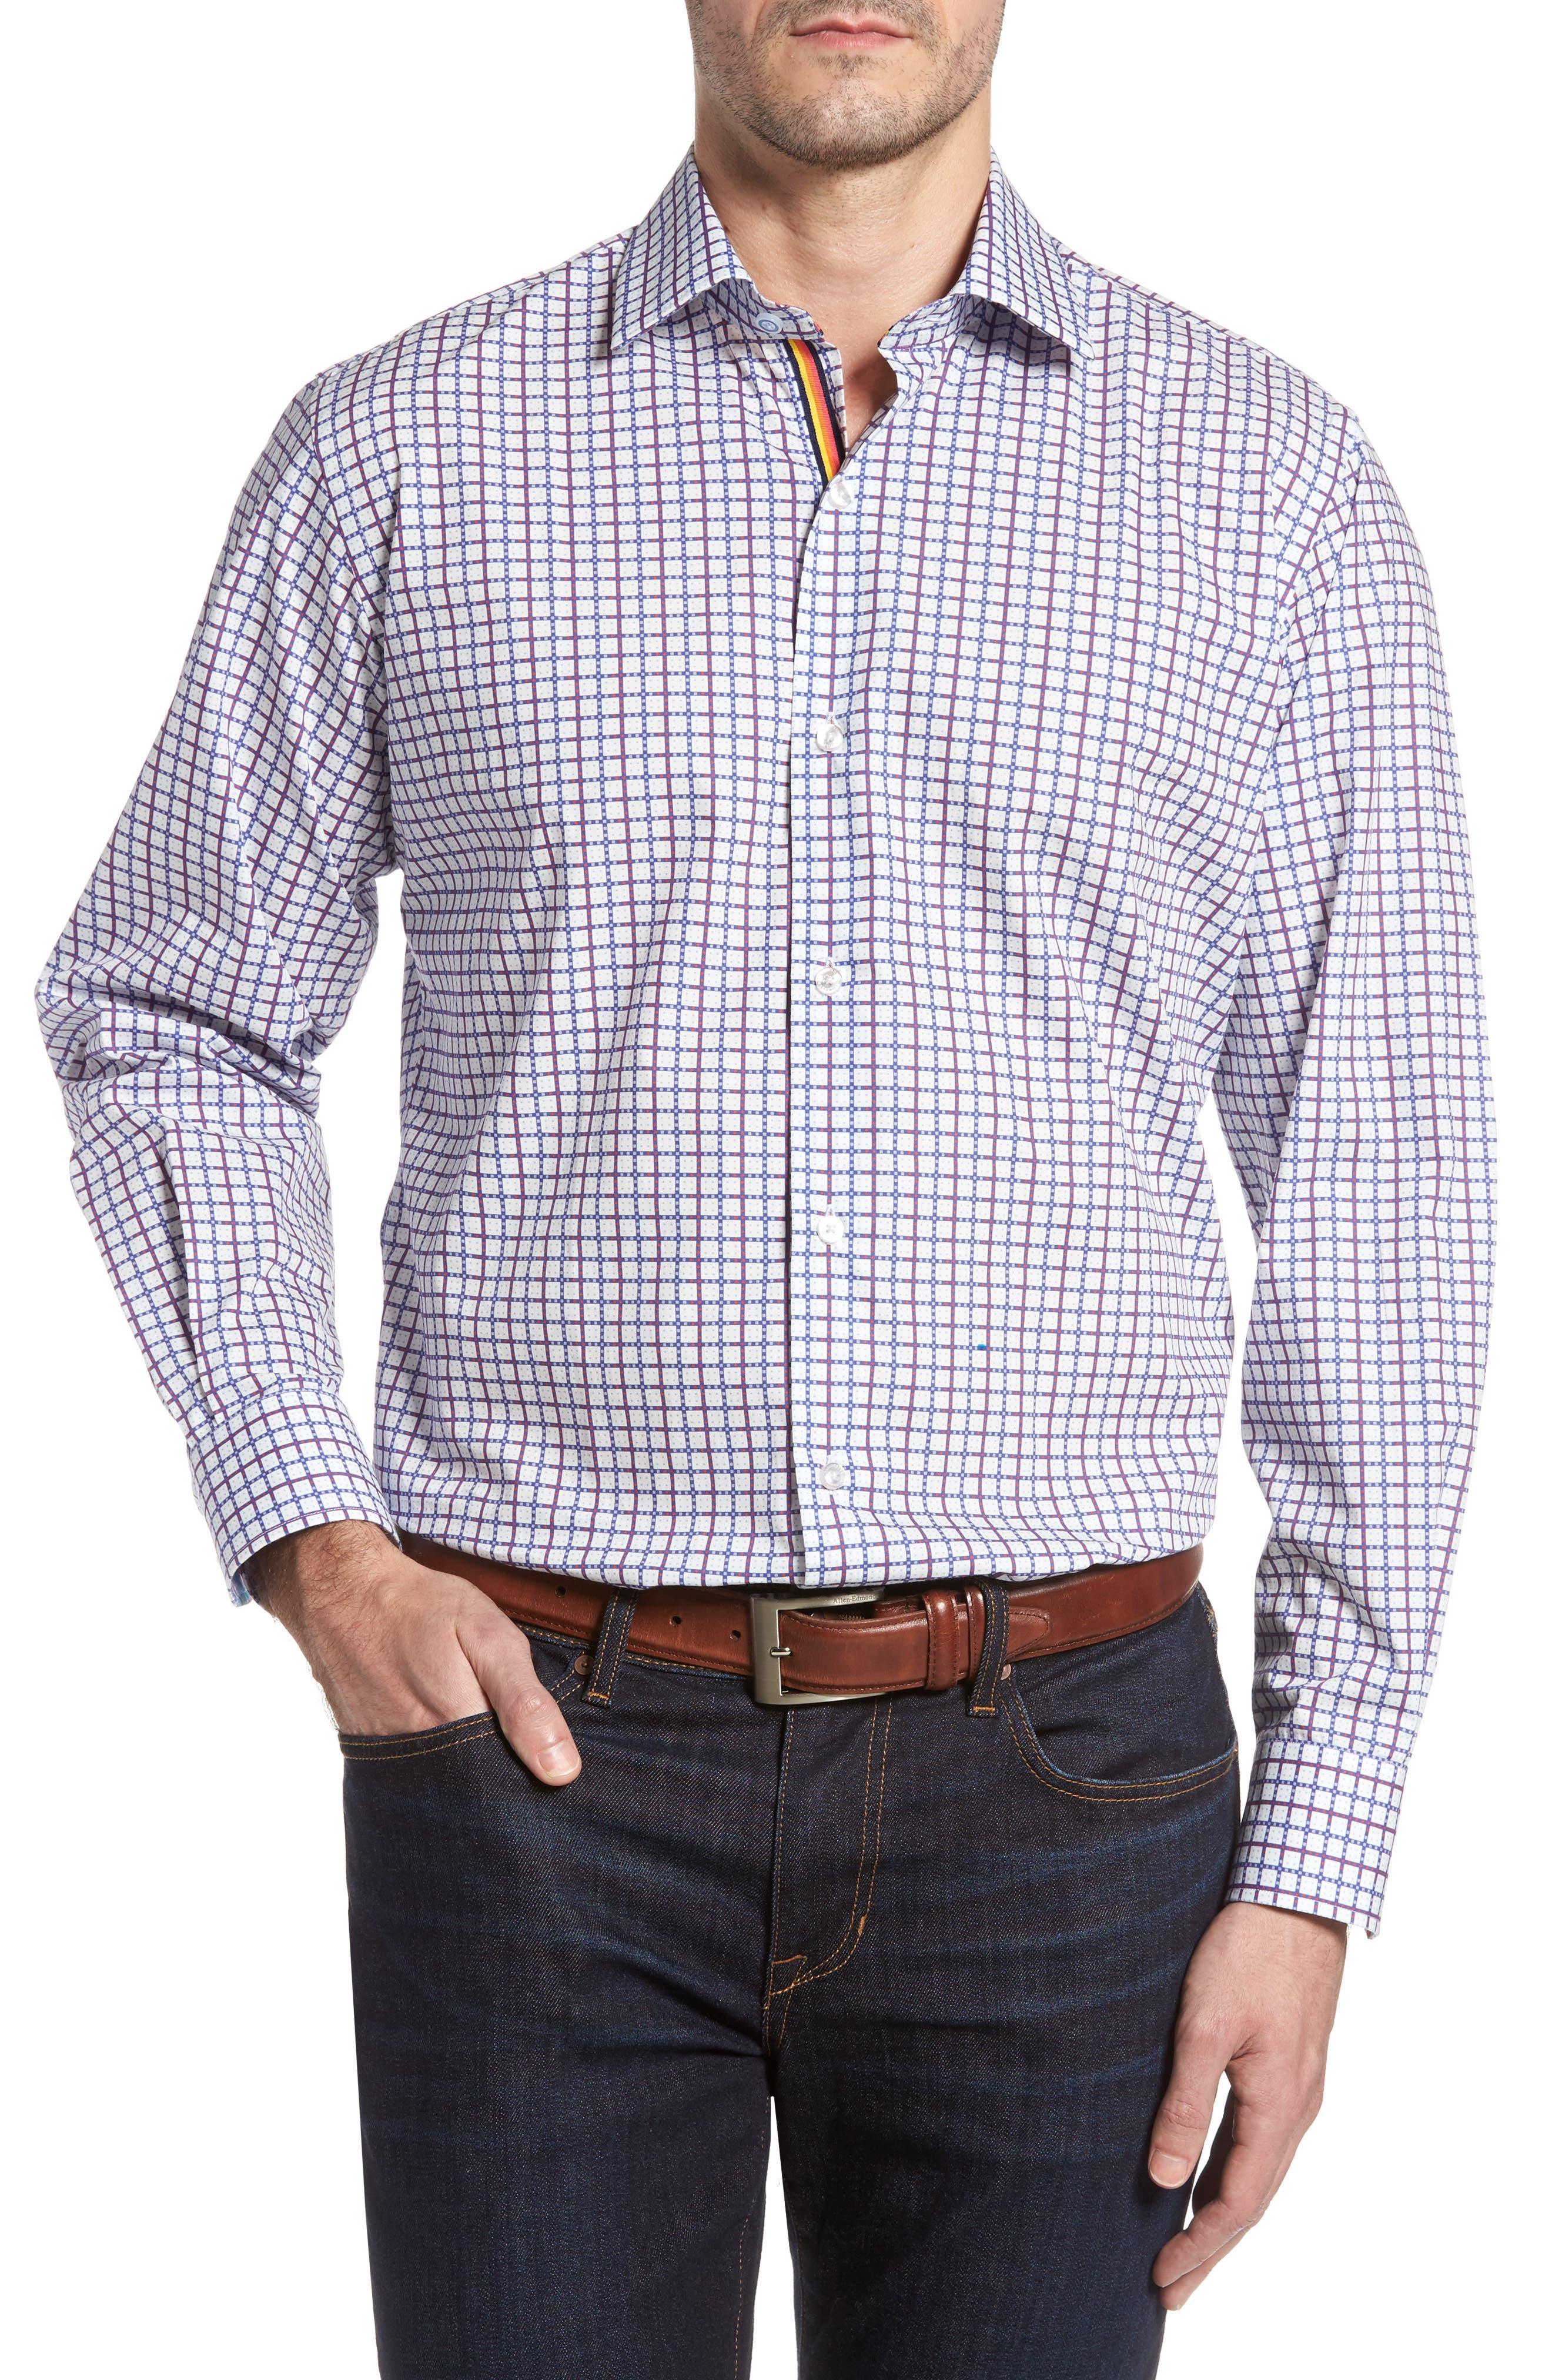 Main Image - TailorByrd Magnolia Sport Shirt